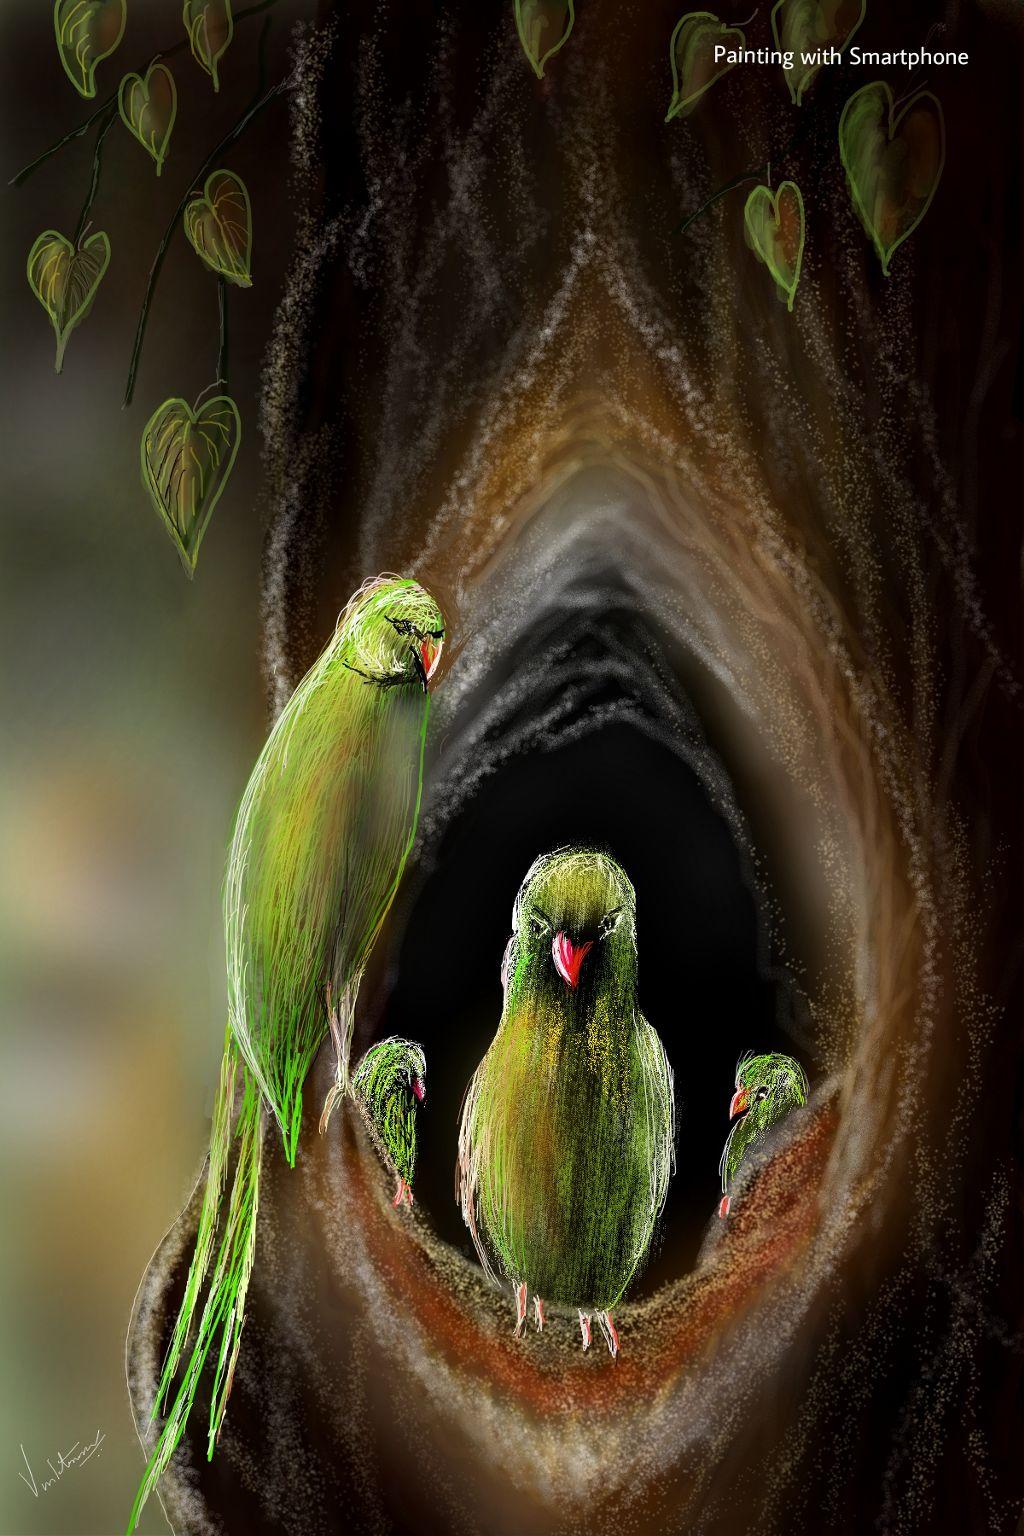 #drawing #share #love #enjoy #beautiful #family #life